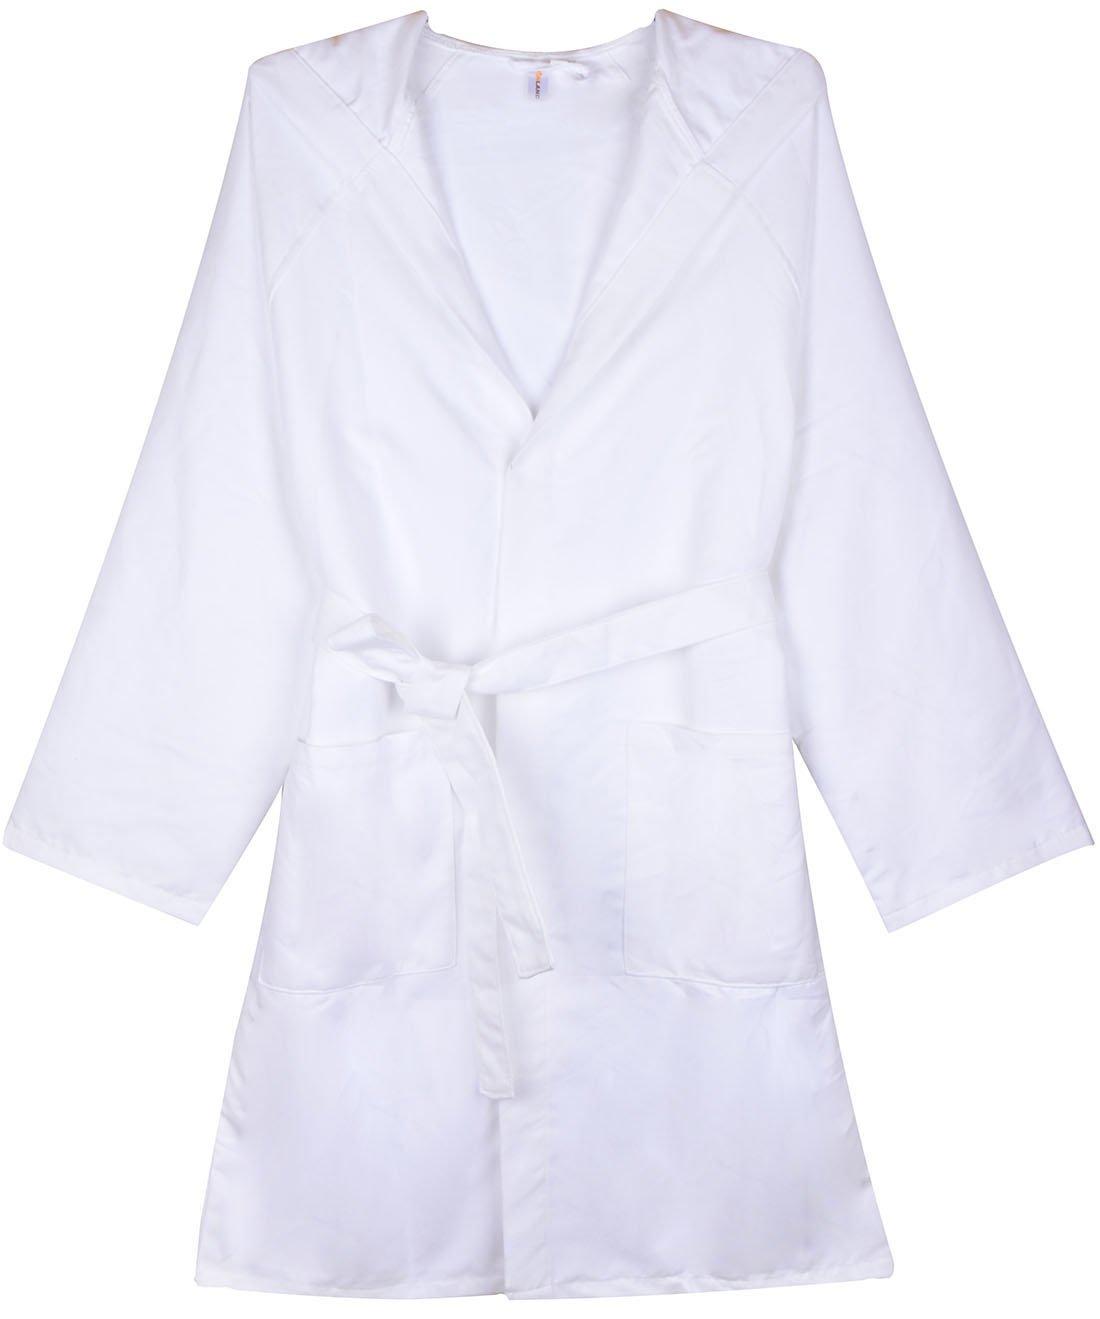 SUNLAND Chamois Microfiber Hooded Bathrobe Unisex Beach Spa Robe L White